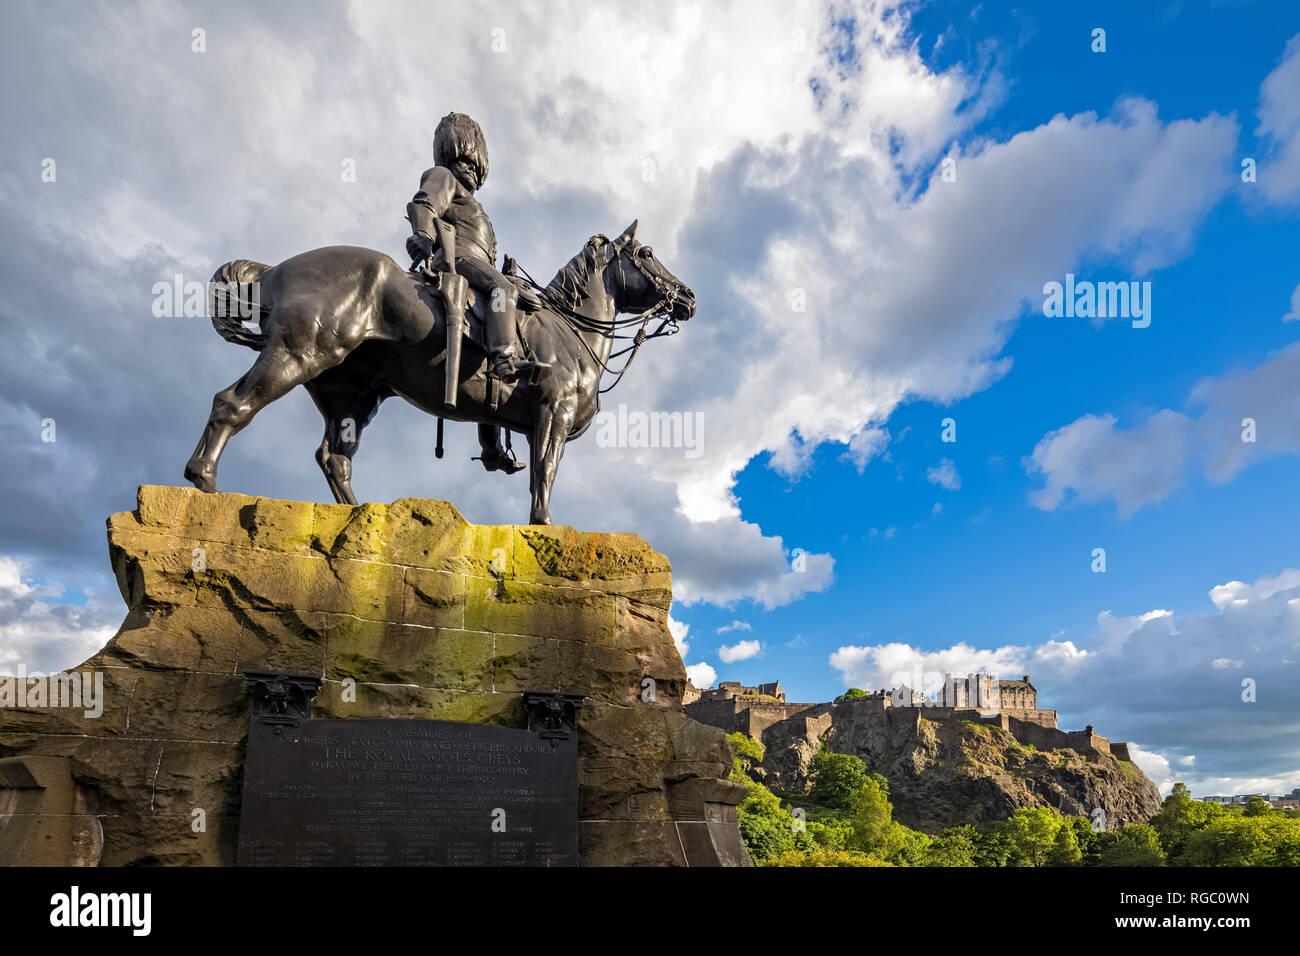 Great Britain, Scotland, Edinburgh, Castle Rock, Edinburgh Castle, Soldier monument The Royal Scot Greys - Stock Image